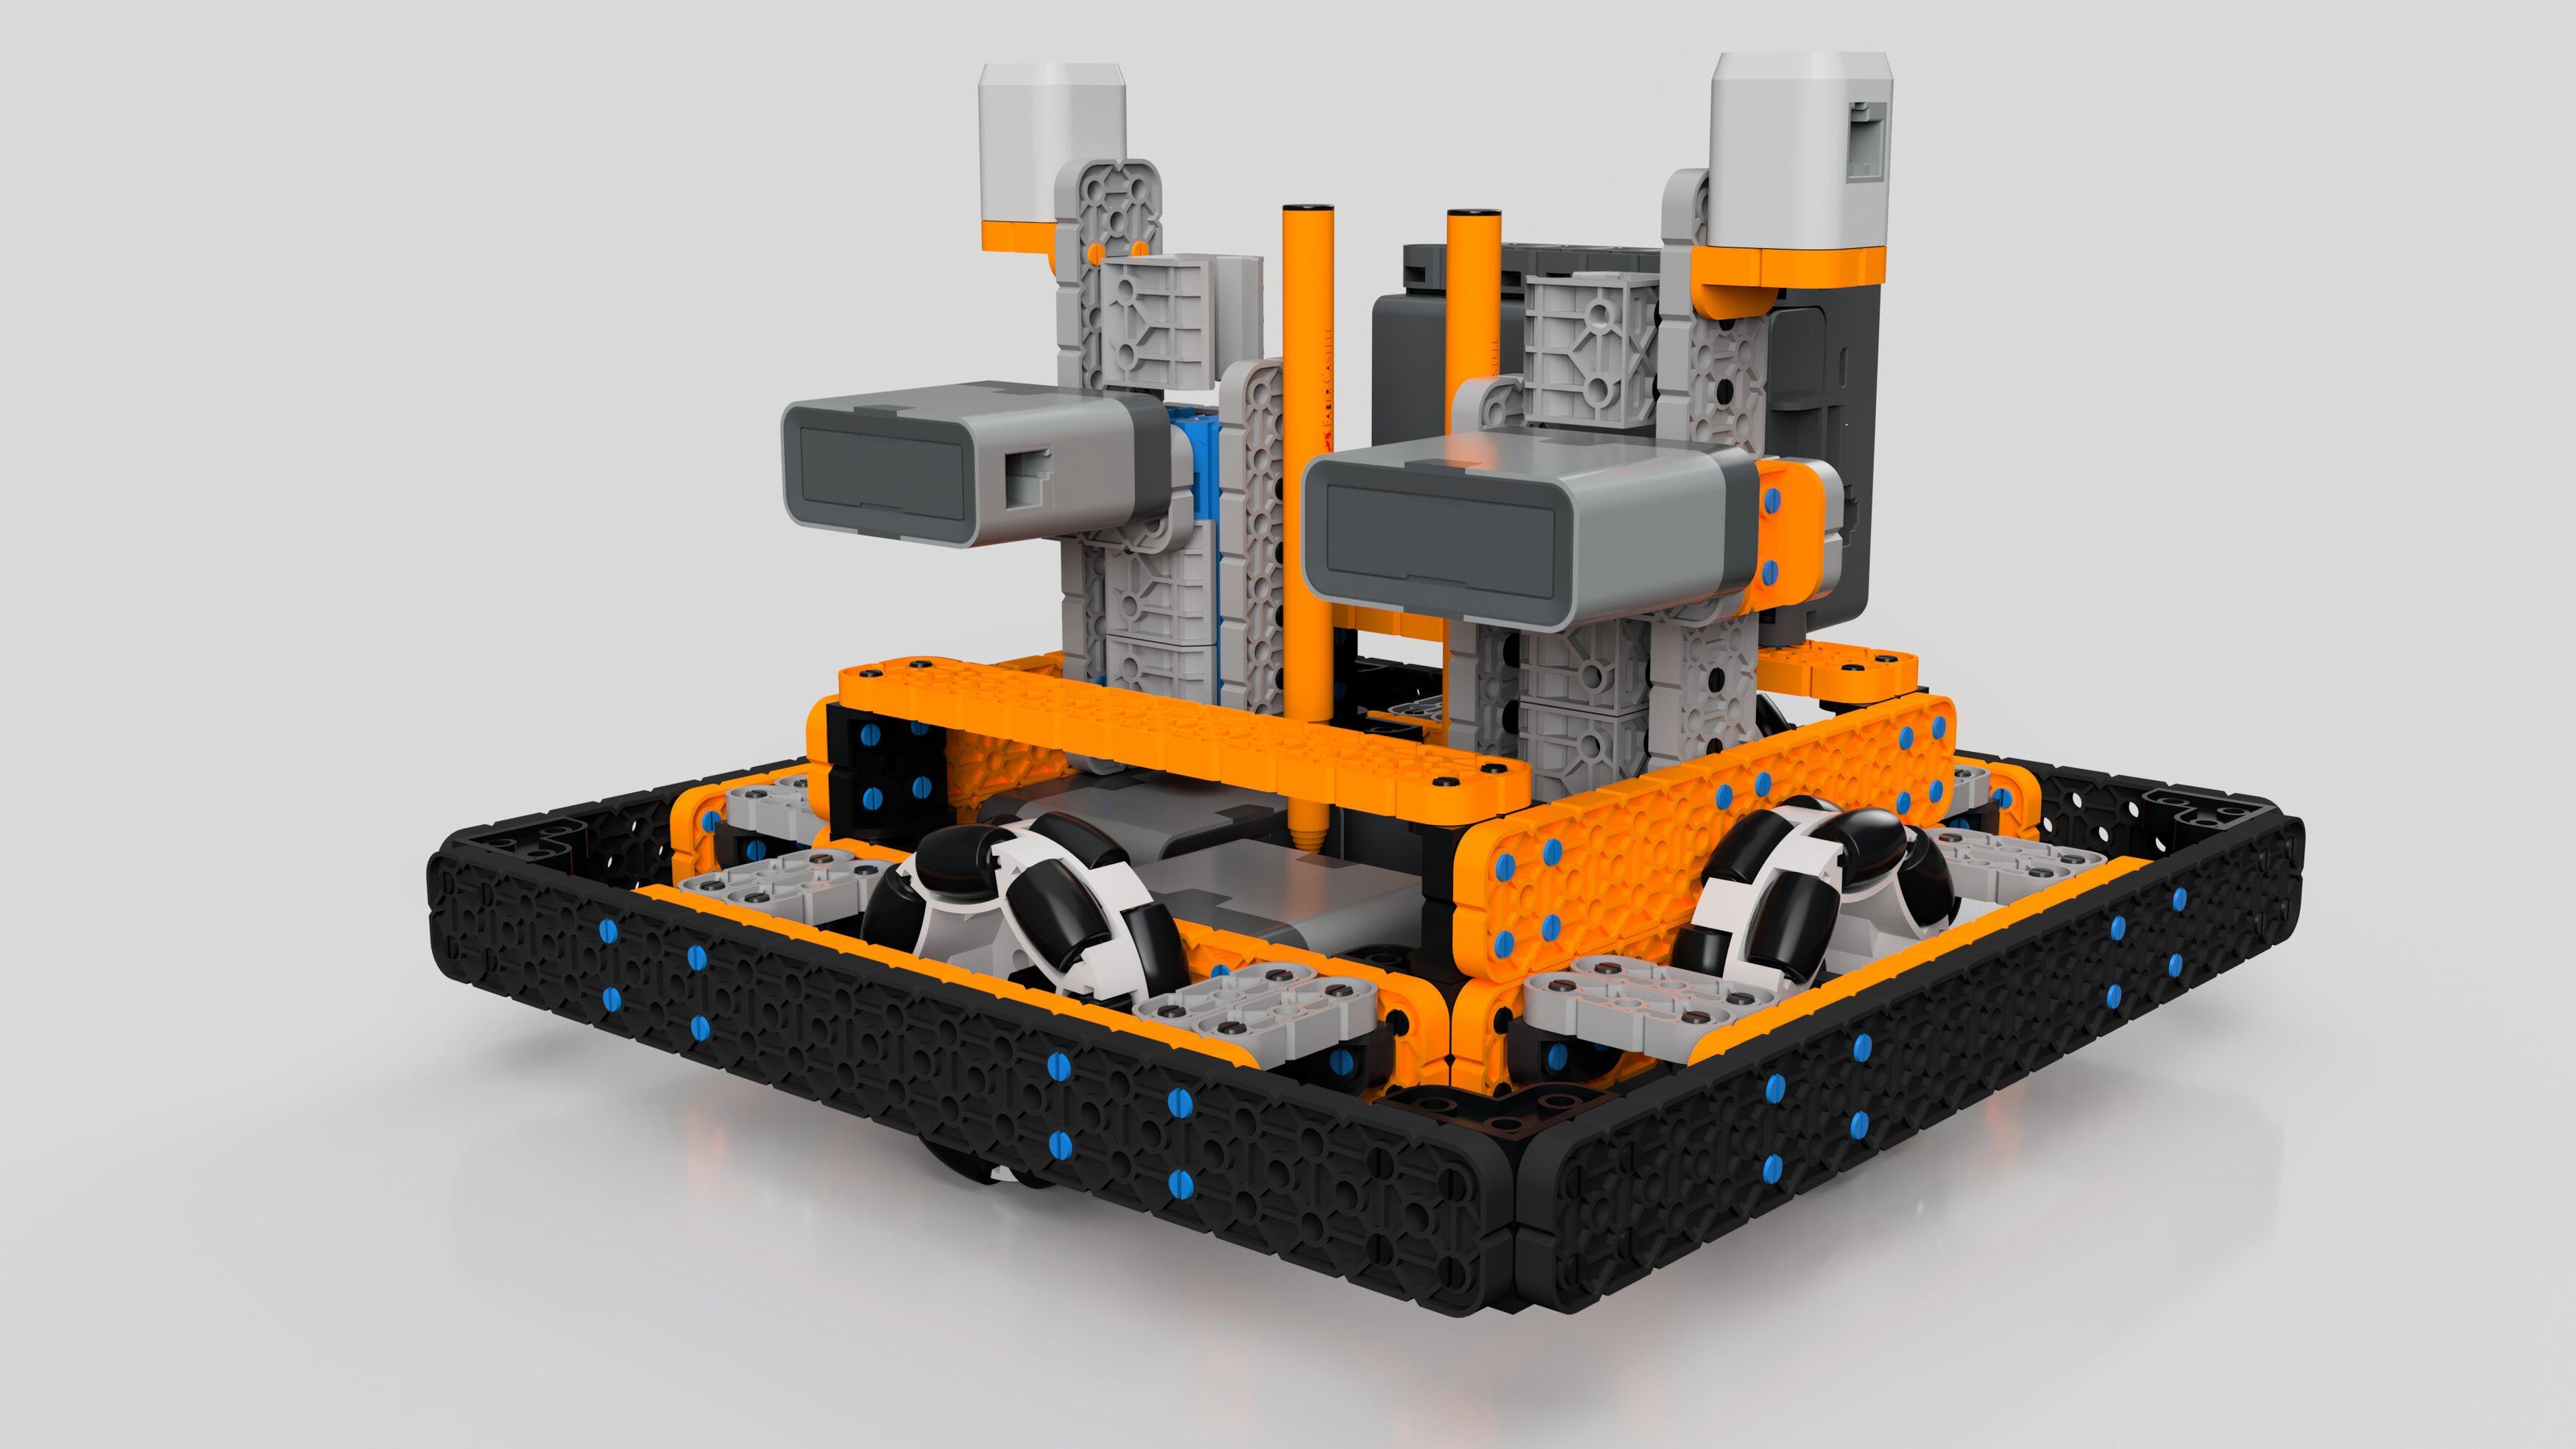 Robotics-pen-oficial-2-cores---fabrica-de-nerdes-2020-may-28-08-02-46pm-000-customizedview42742773772-png-3500-3500